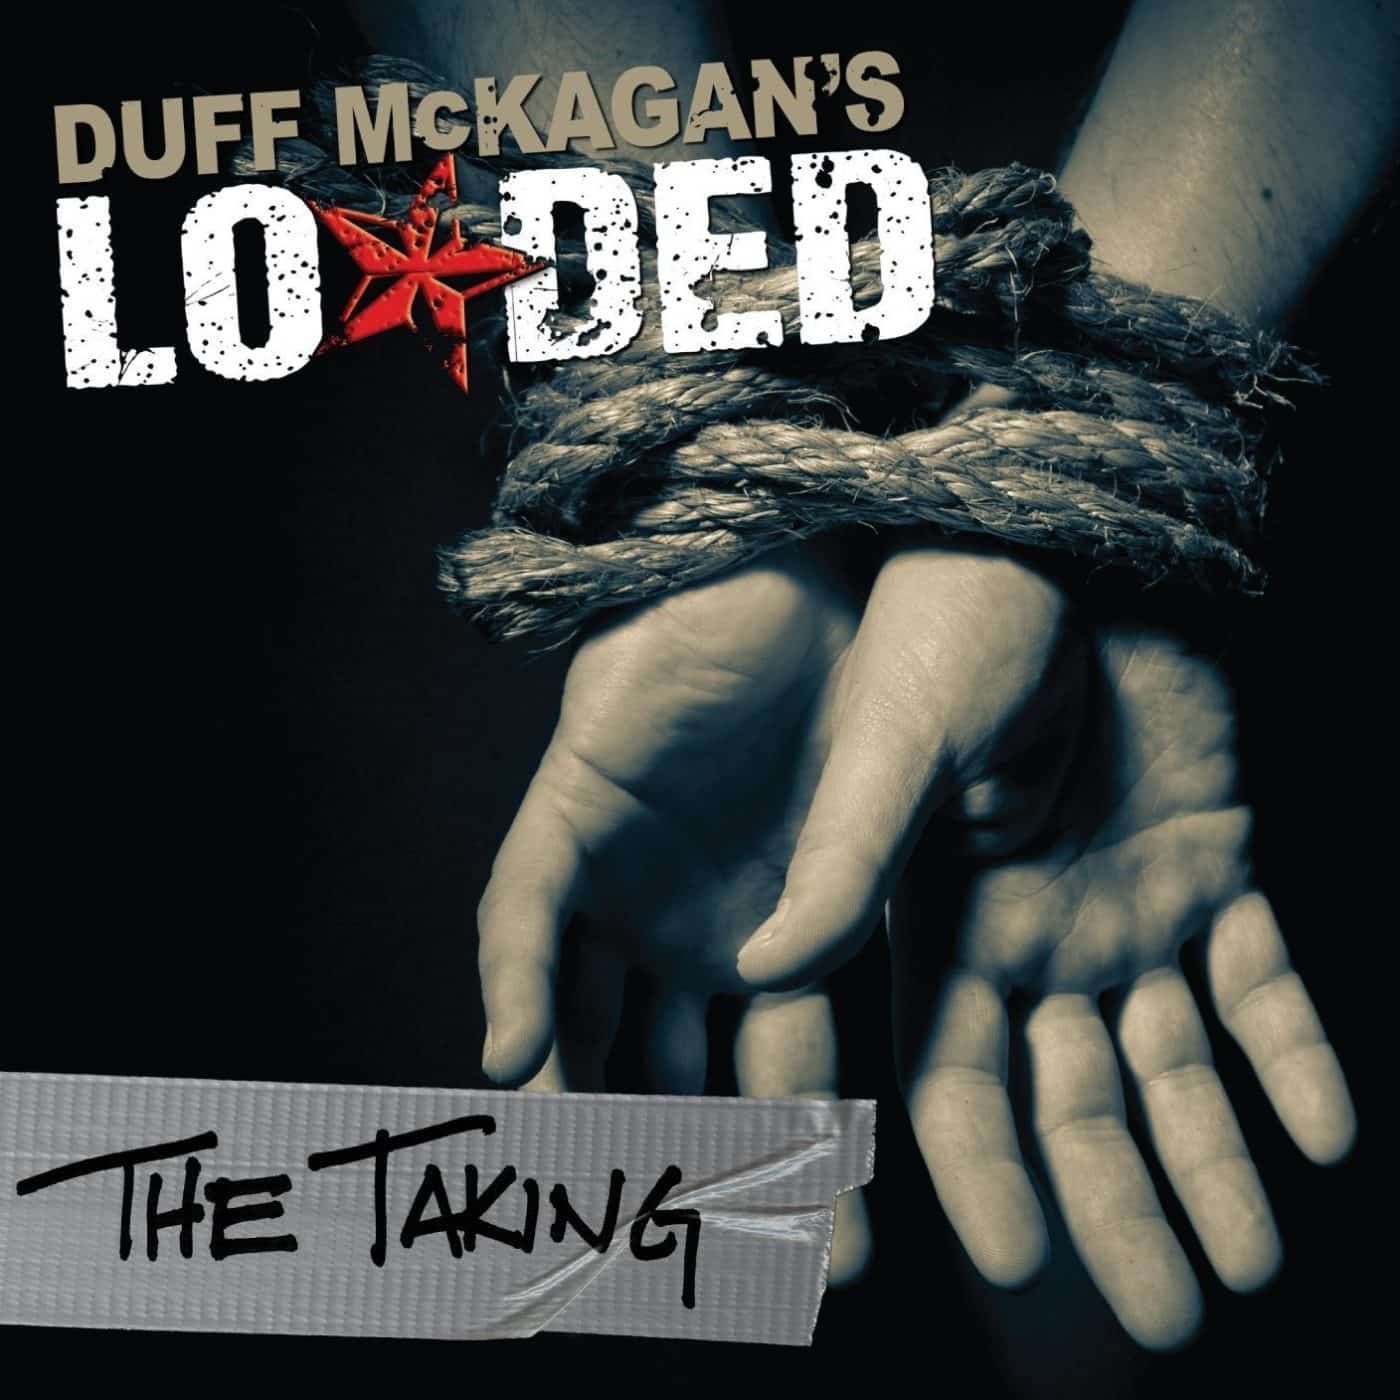 Duff McKagan's Loaded -The Taking (Vinyl)